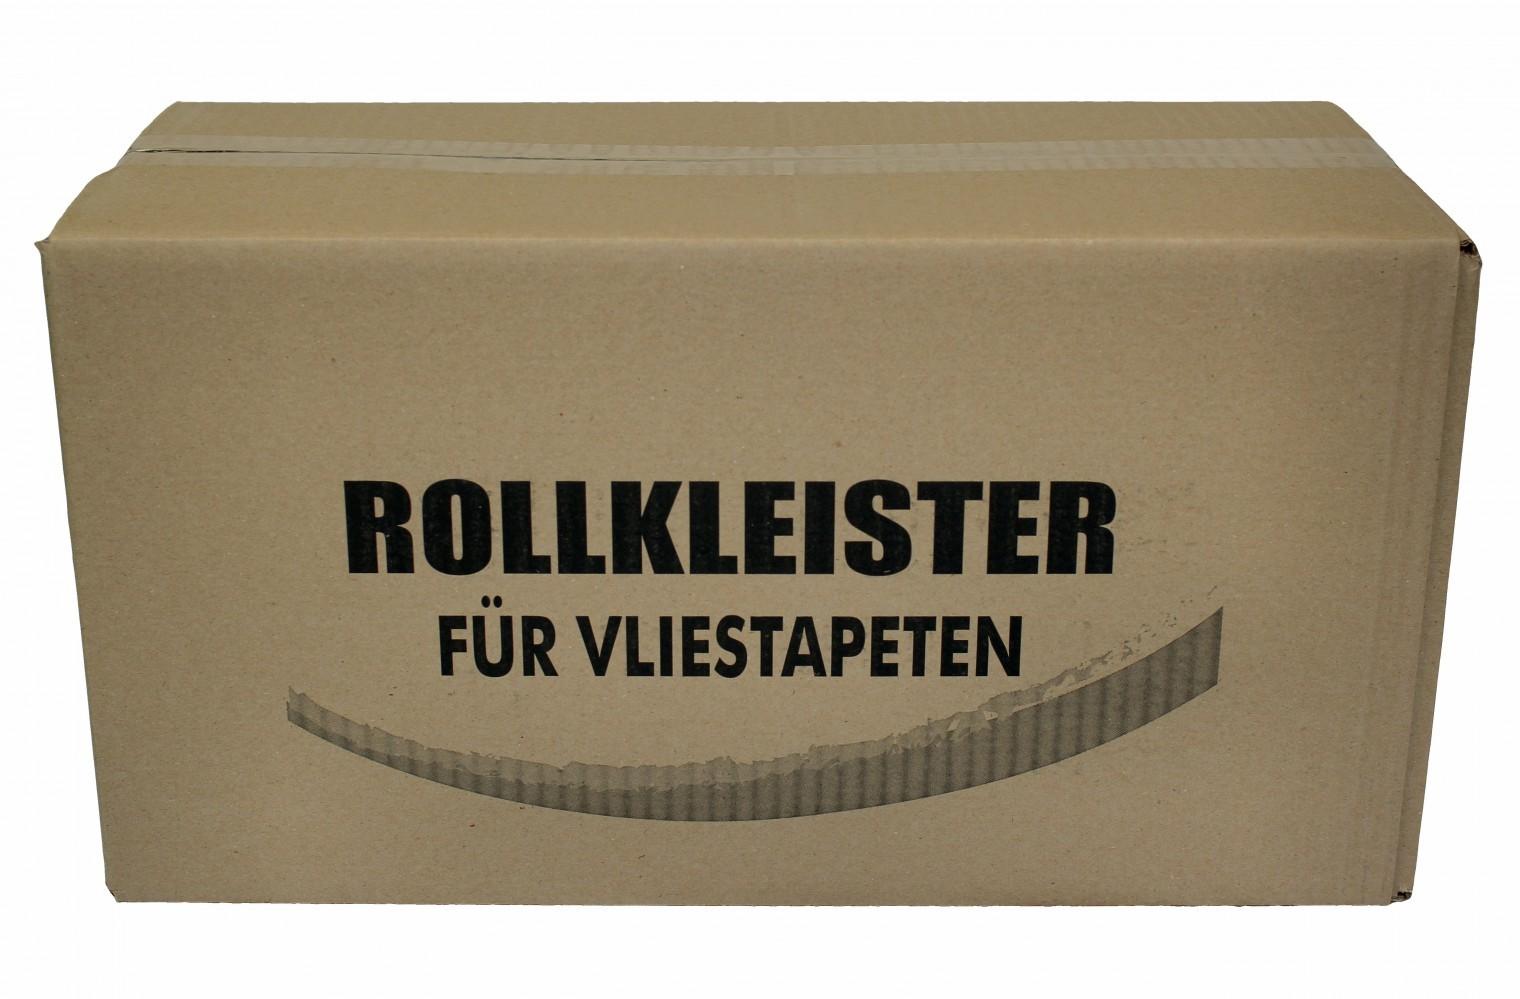 40 pakete vlieskleister rollkleister kleister f r vliestapeten vlieskleber 8 kg. Black Bedroom Furniture Sets. Home Design Ideas